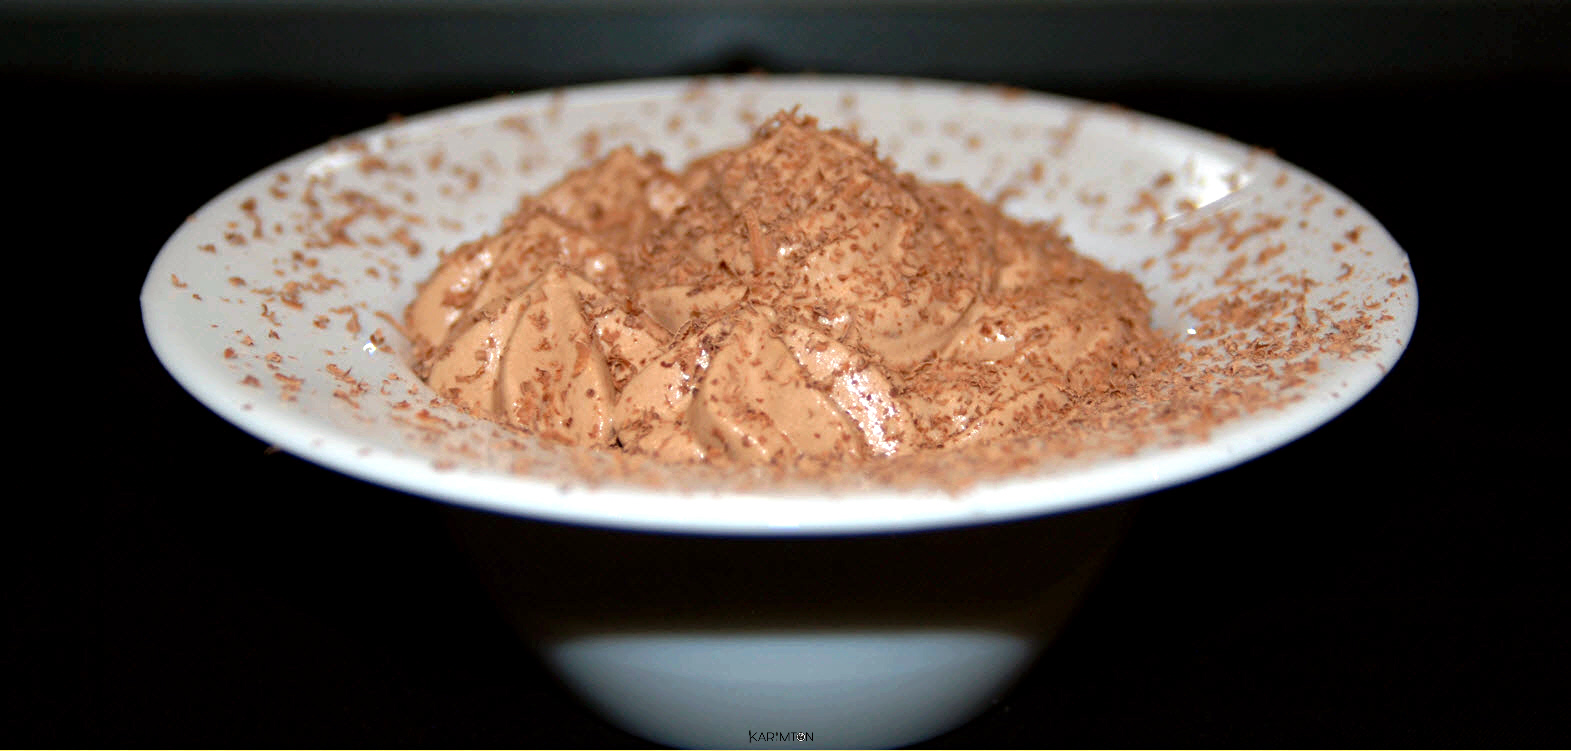 Mousse au chocolat karimton